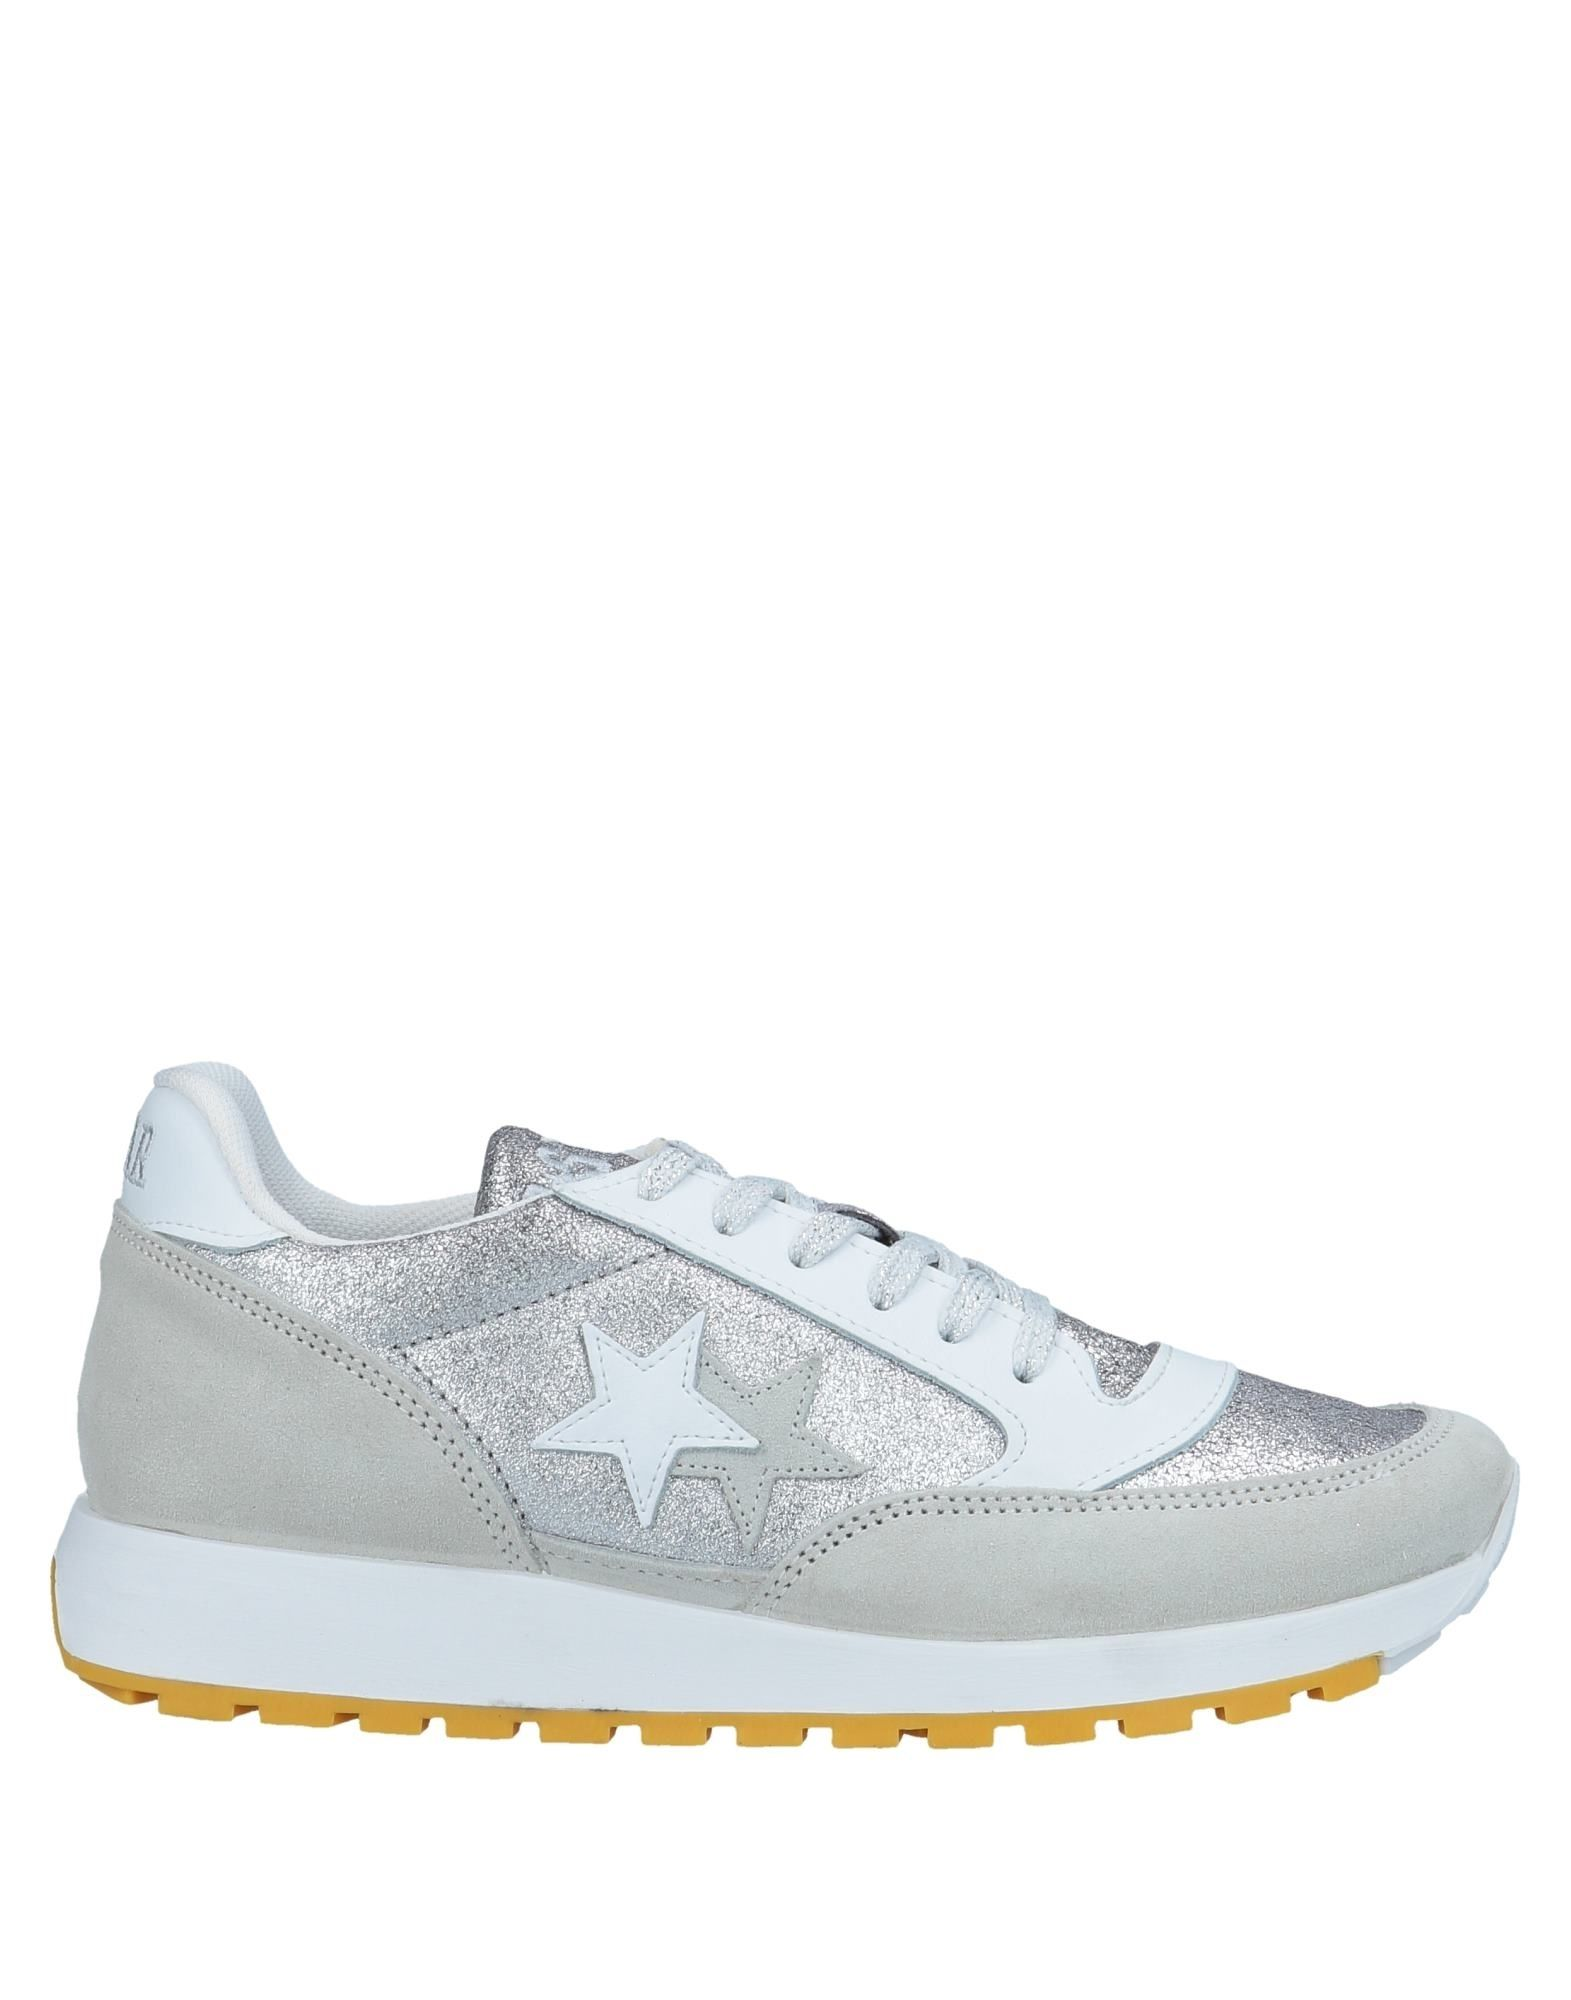 2Star Sneakers - Women 2Star Sneakers - online on  Canada - Sneakers 11554012FQ 737d57